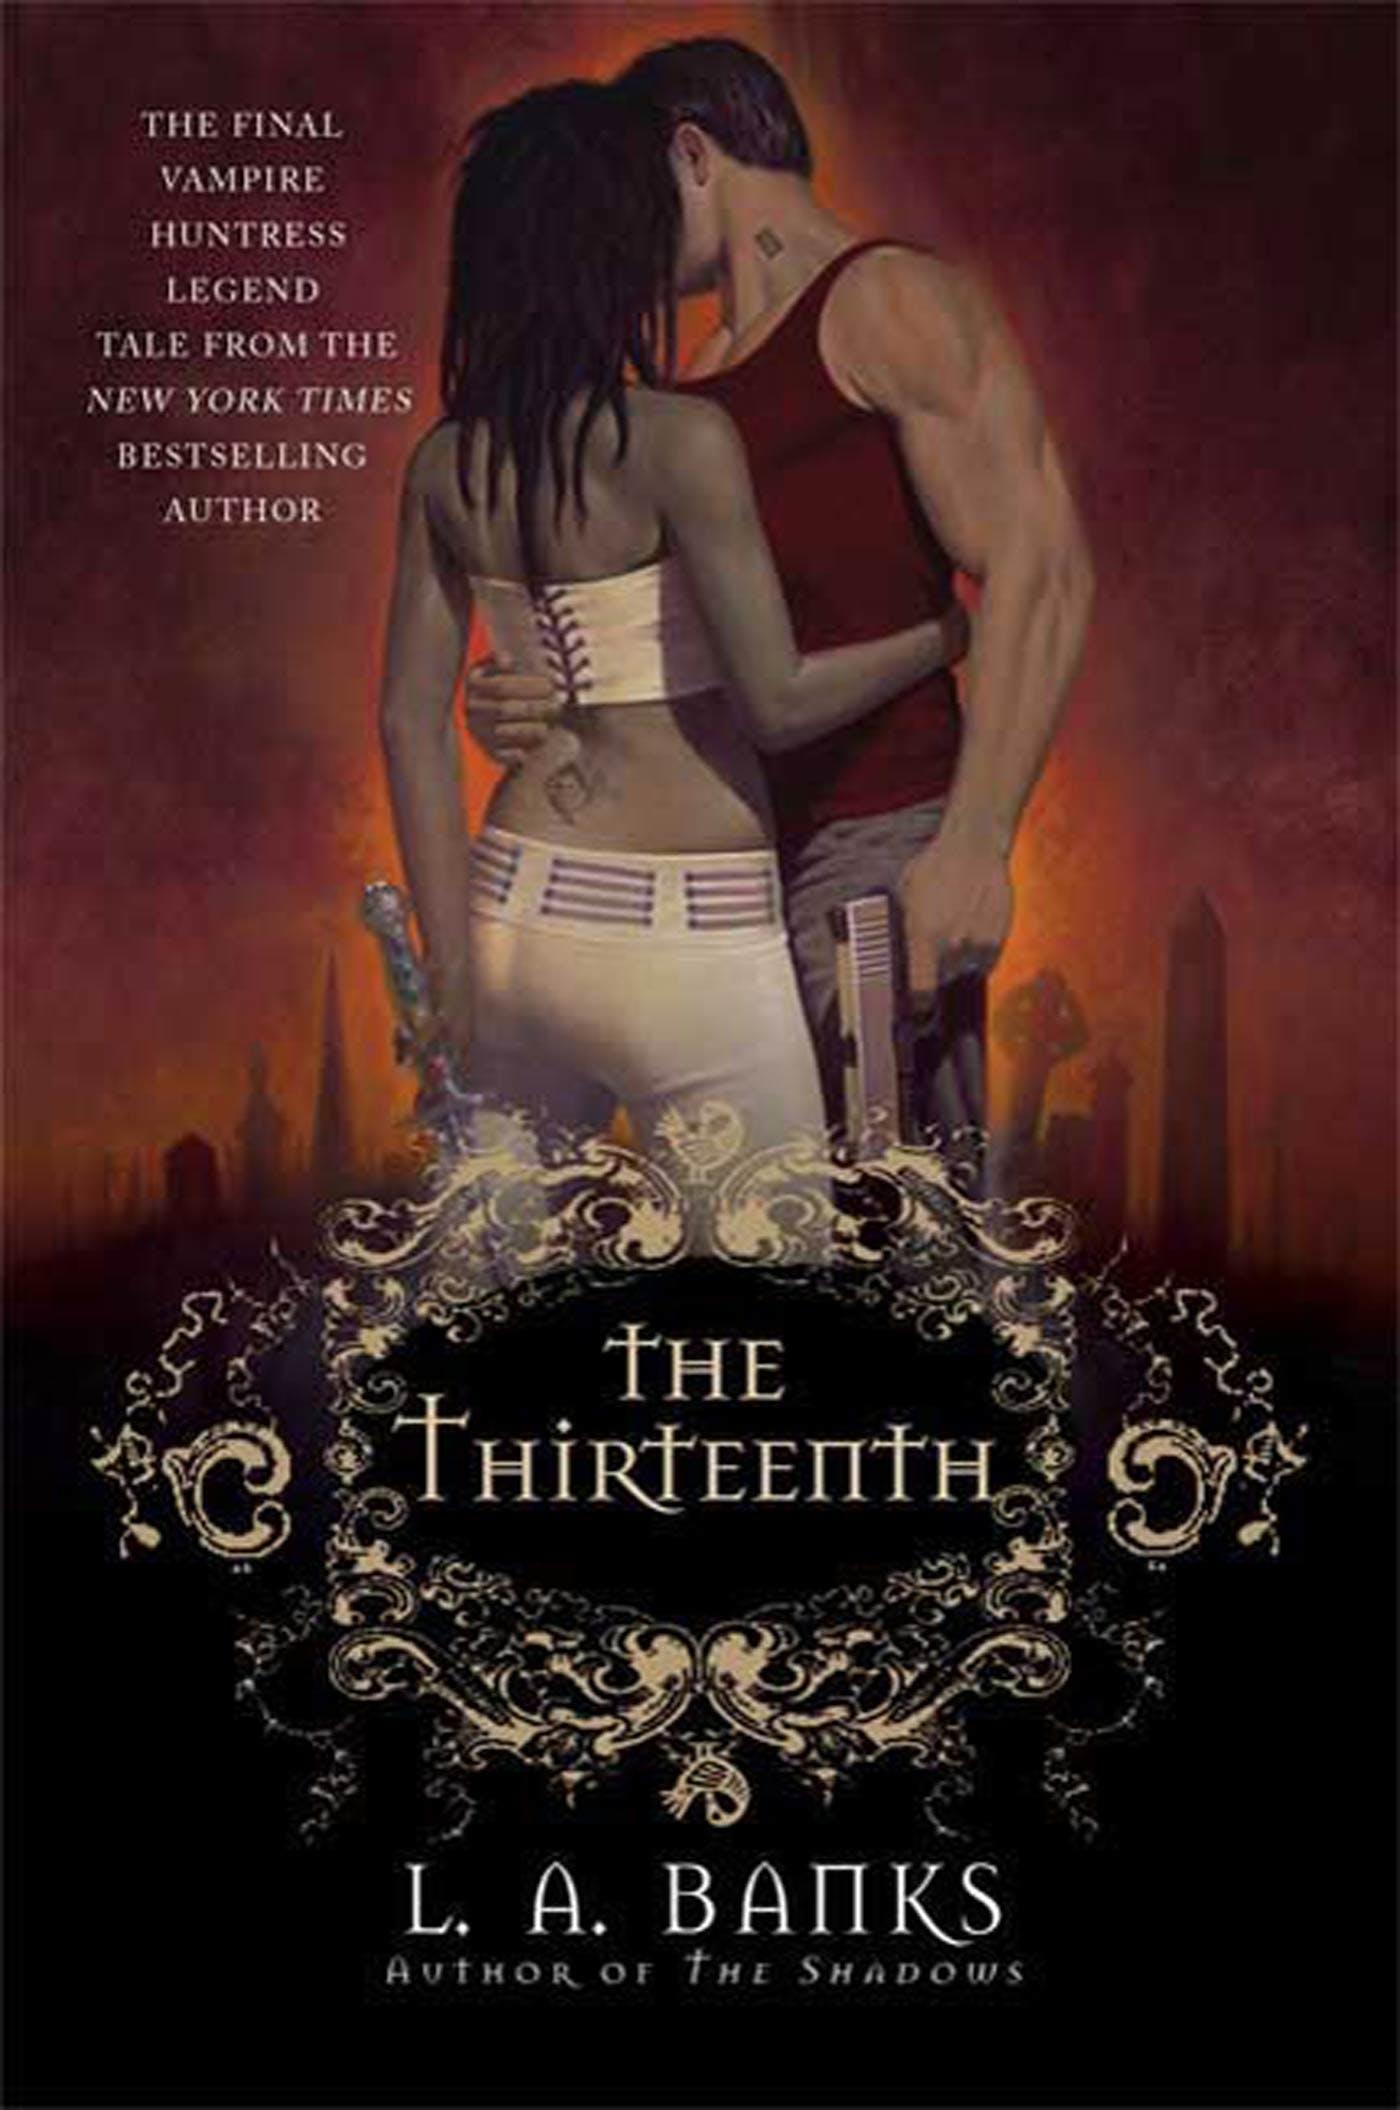 Image of The Thirteenth